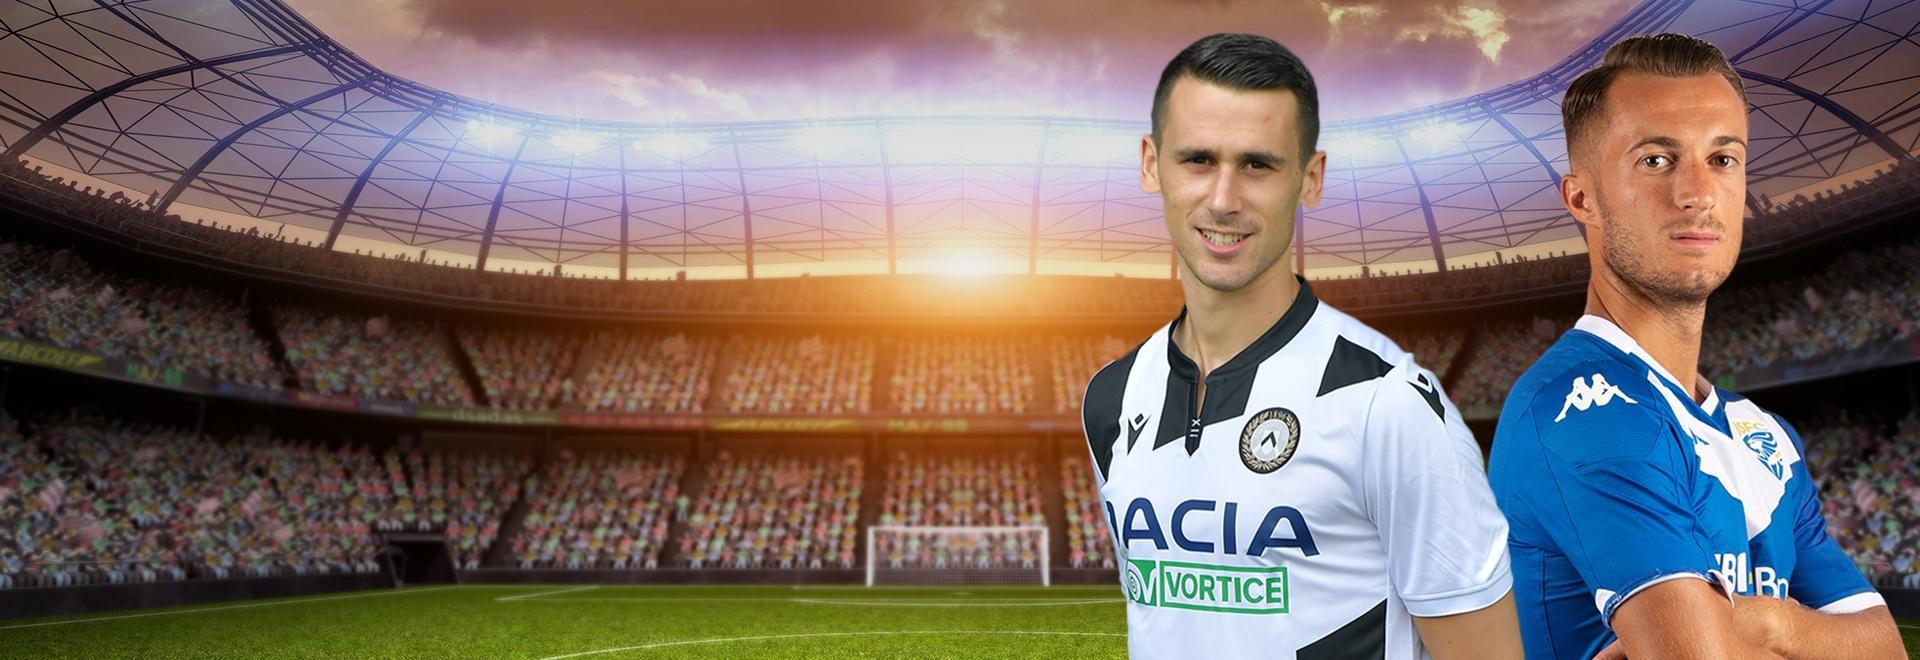 Udinese - Brescia. 4a g.